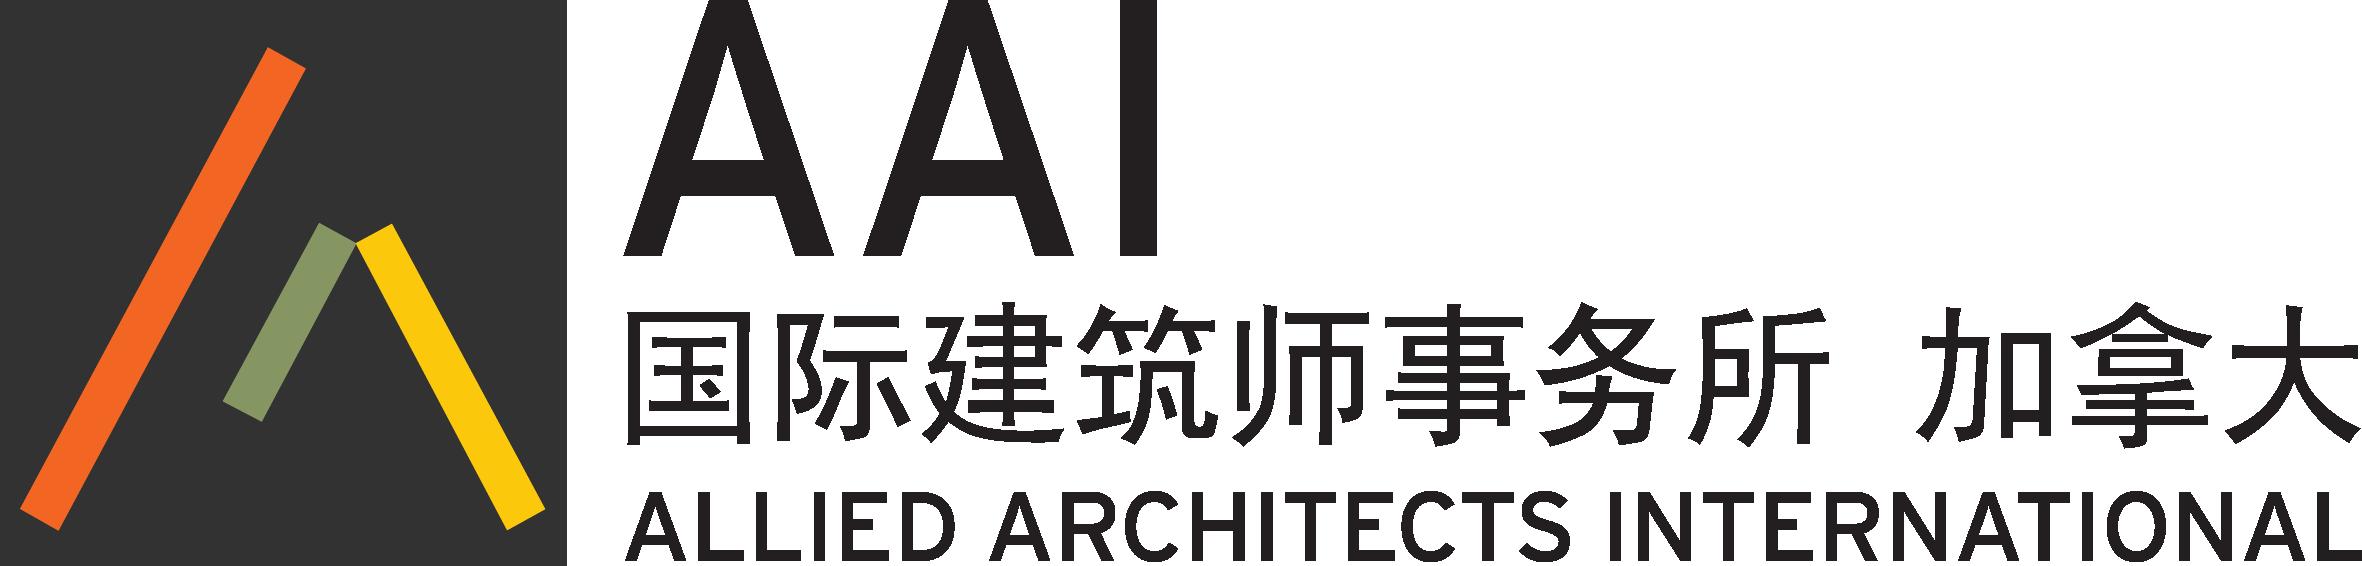 AAI在中国大陆已完成设计的项目累计1000余个,已建成项目100余个。其中项目获得奖项共90余个。我们为客户提供国际水准的建筑设计、城市设计、区域规划等全方位系统化的服务,始终致力于从设计城市活动出发,通过对居住、工作、学习、休闲等多样城市生活的混合植入,对交通设施、商业街区、文教体育、开放空间的构建引入,以及对人文历史、地域特征、自然生态、先进科技的挖掘运用,规划出丰富多元、具有引领性的城市生活空间,设计业务广泛铺展在商业综合体、住宅、酒店、办公楼、产业园等领域。让设计优化人类的生活居住环境,最终实现